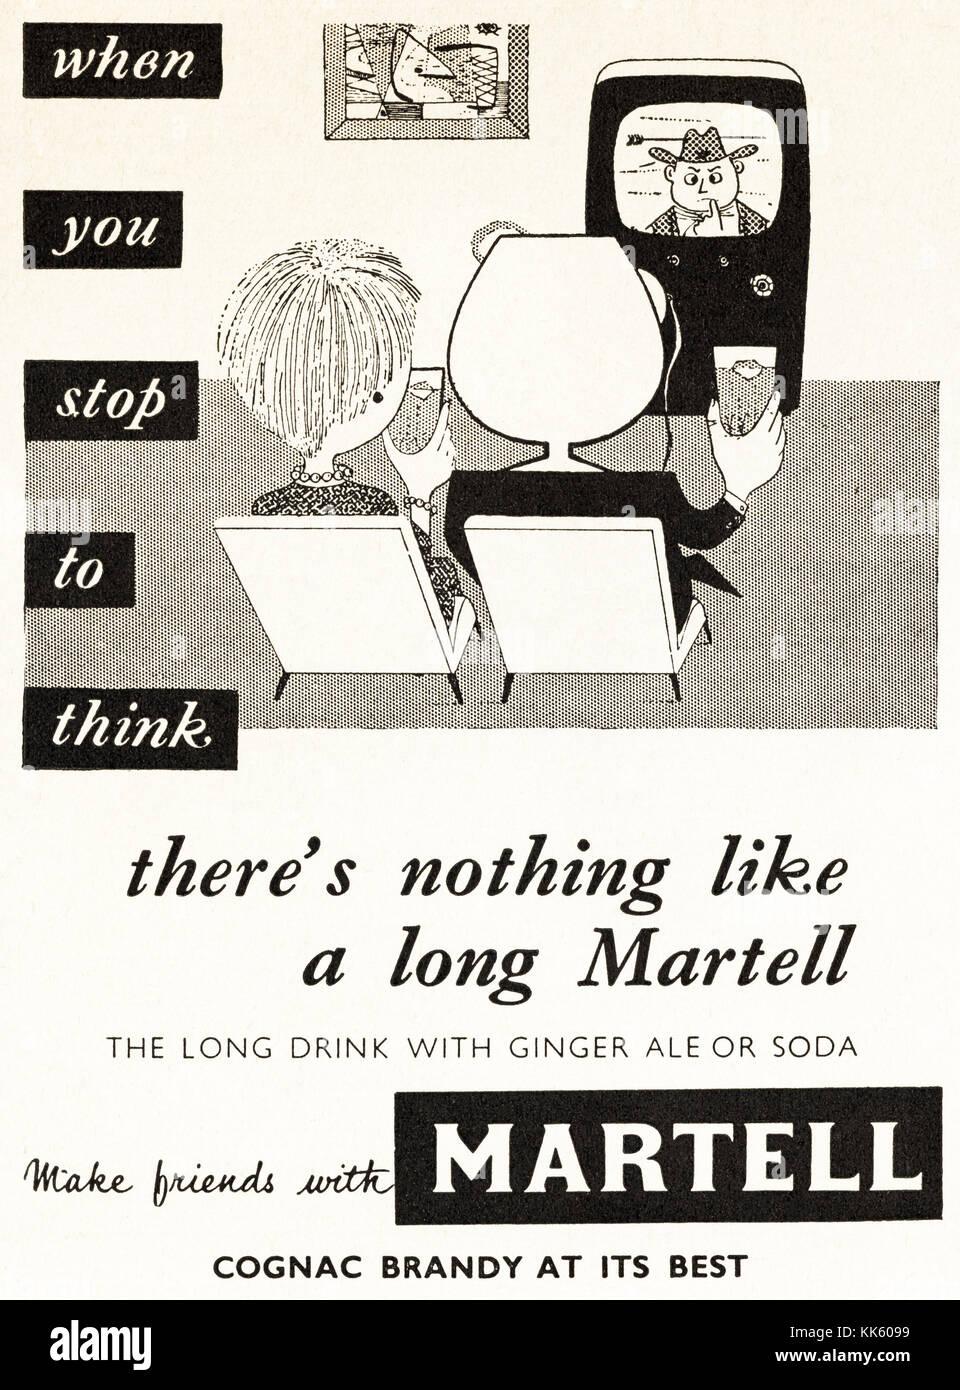 1950s old vintage original advert british magazine print advertisement advertising Martell cognac brandy dated 1958 - Stock Image